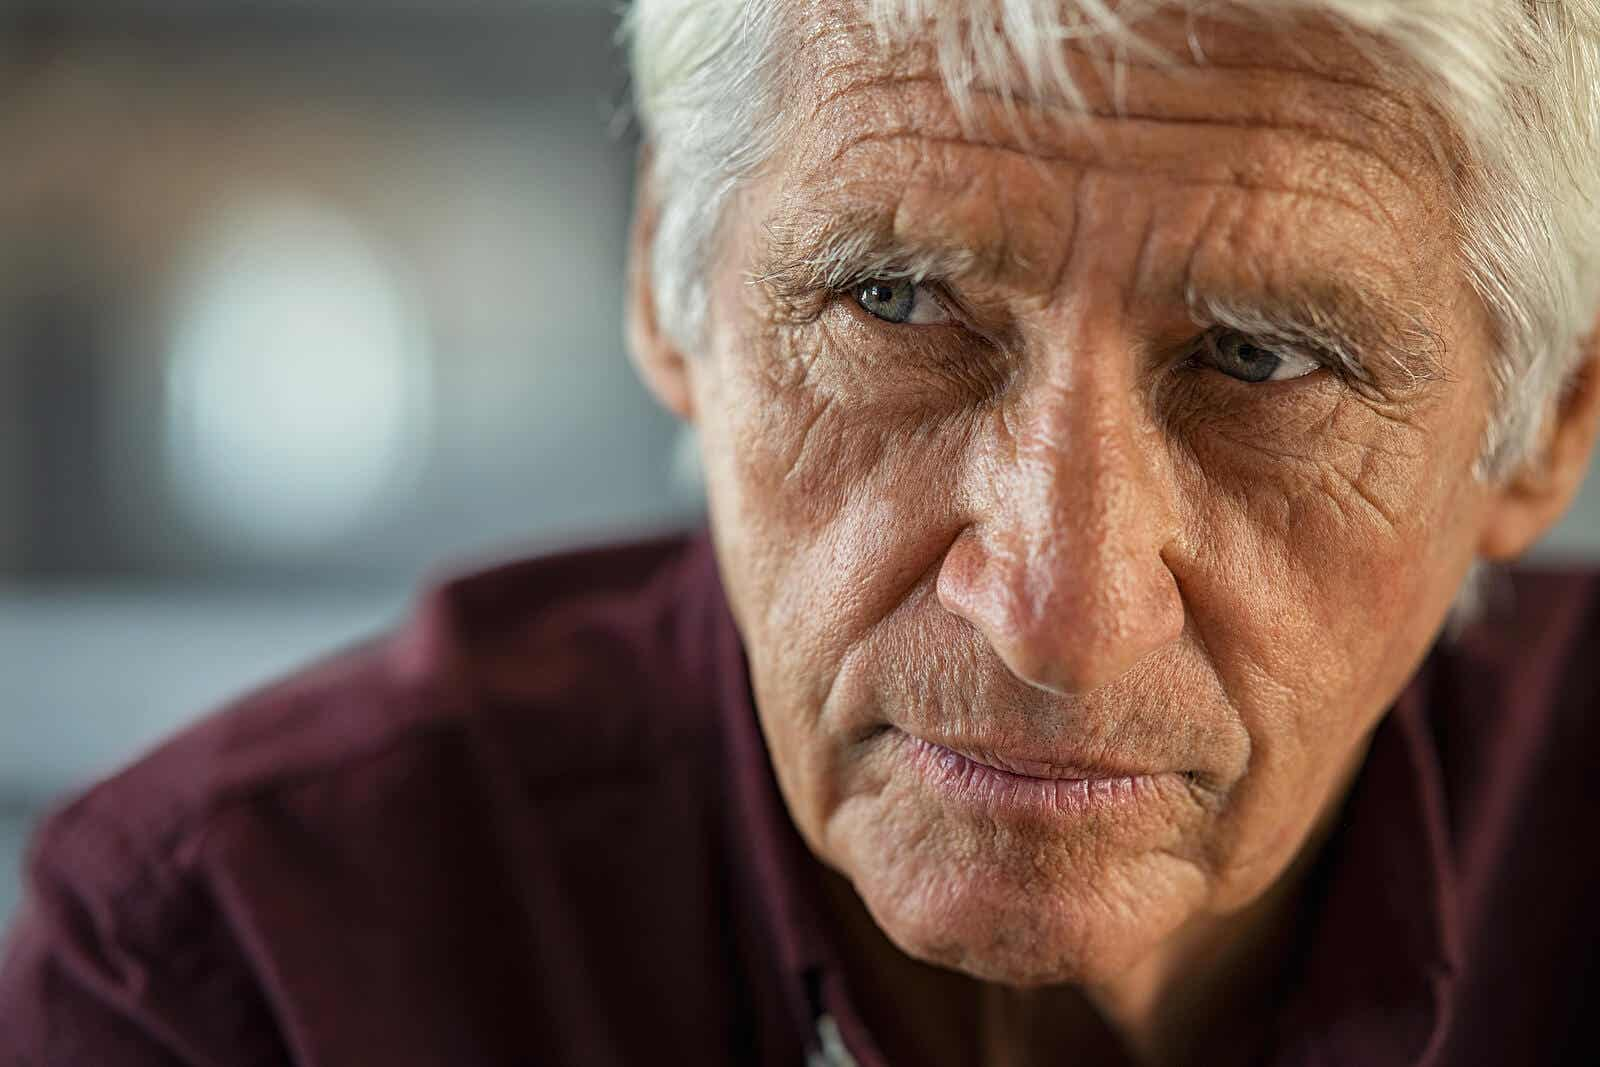 A man with Alzheimer's disease